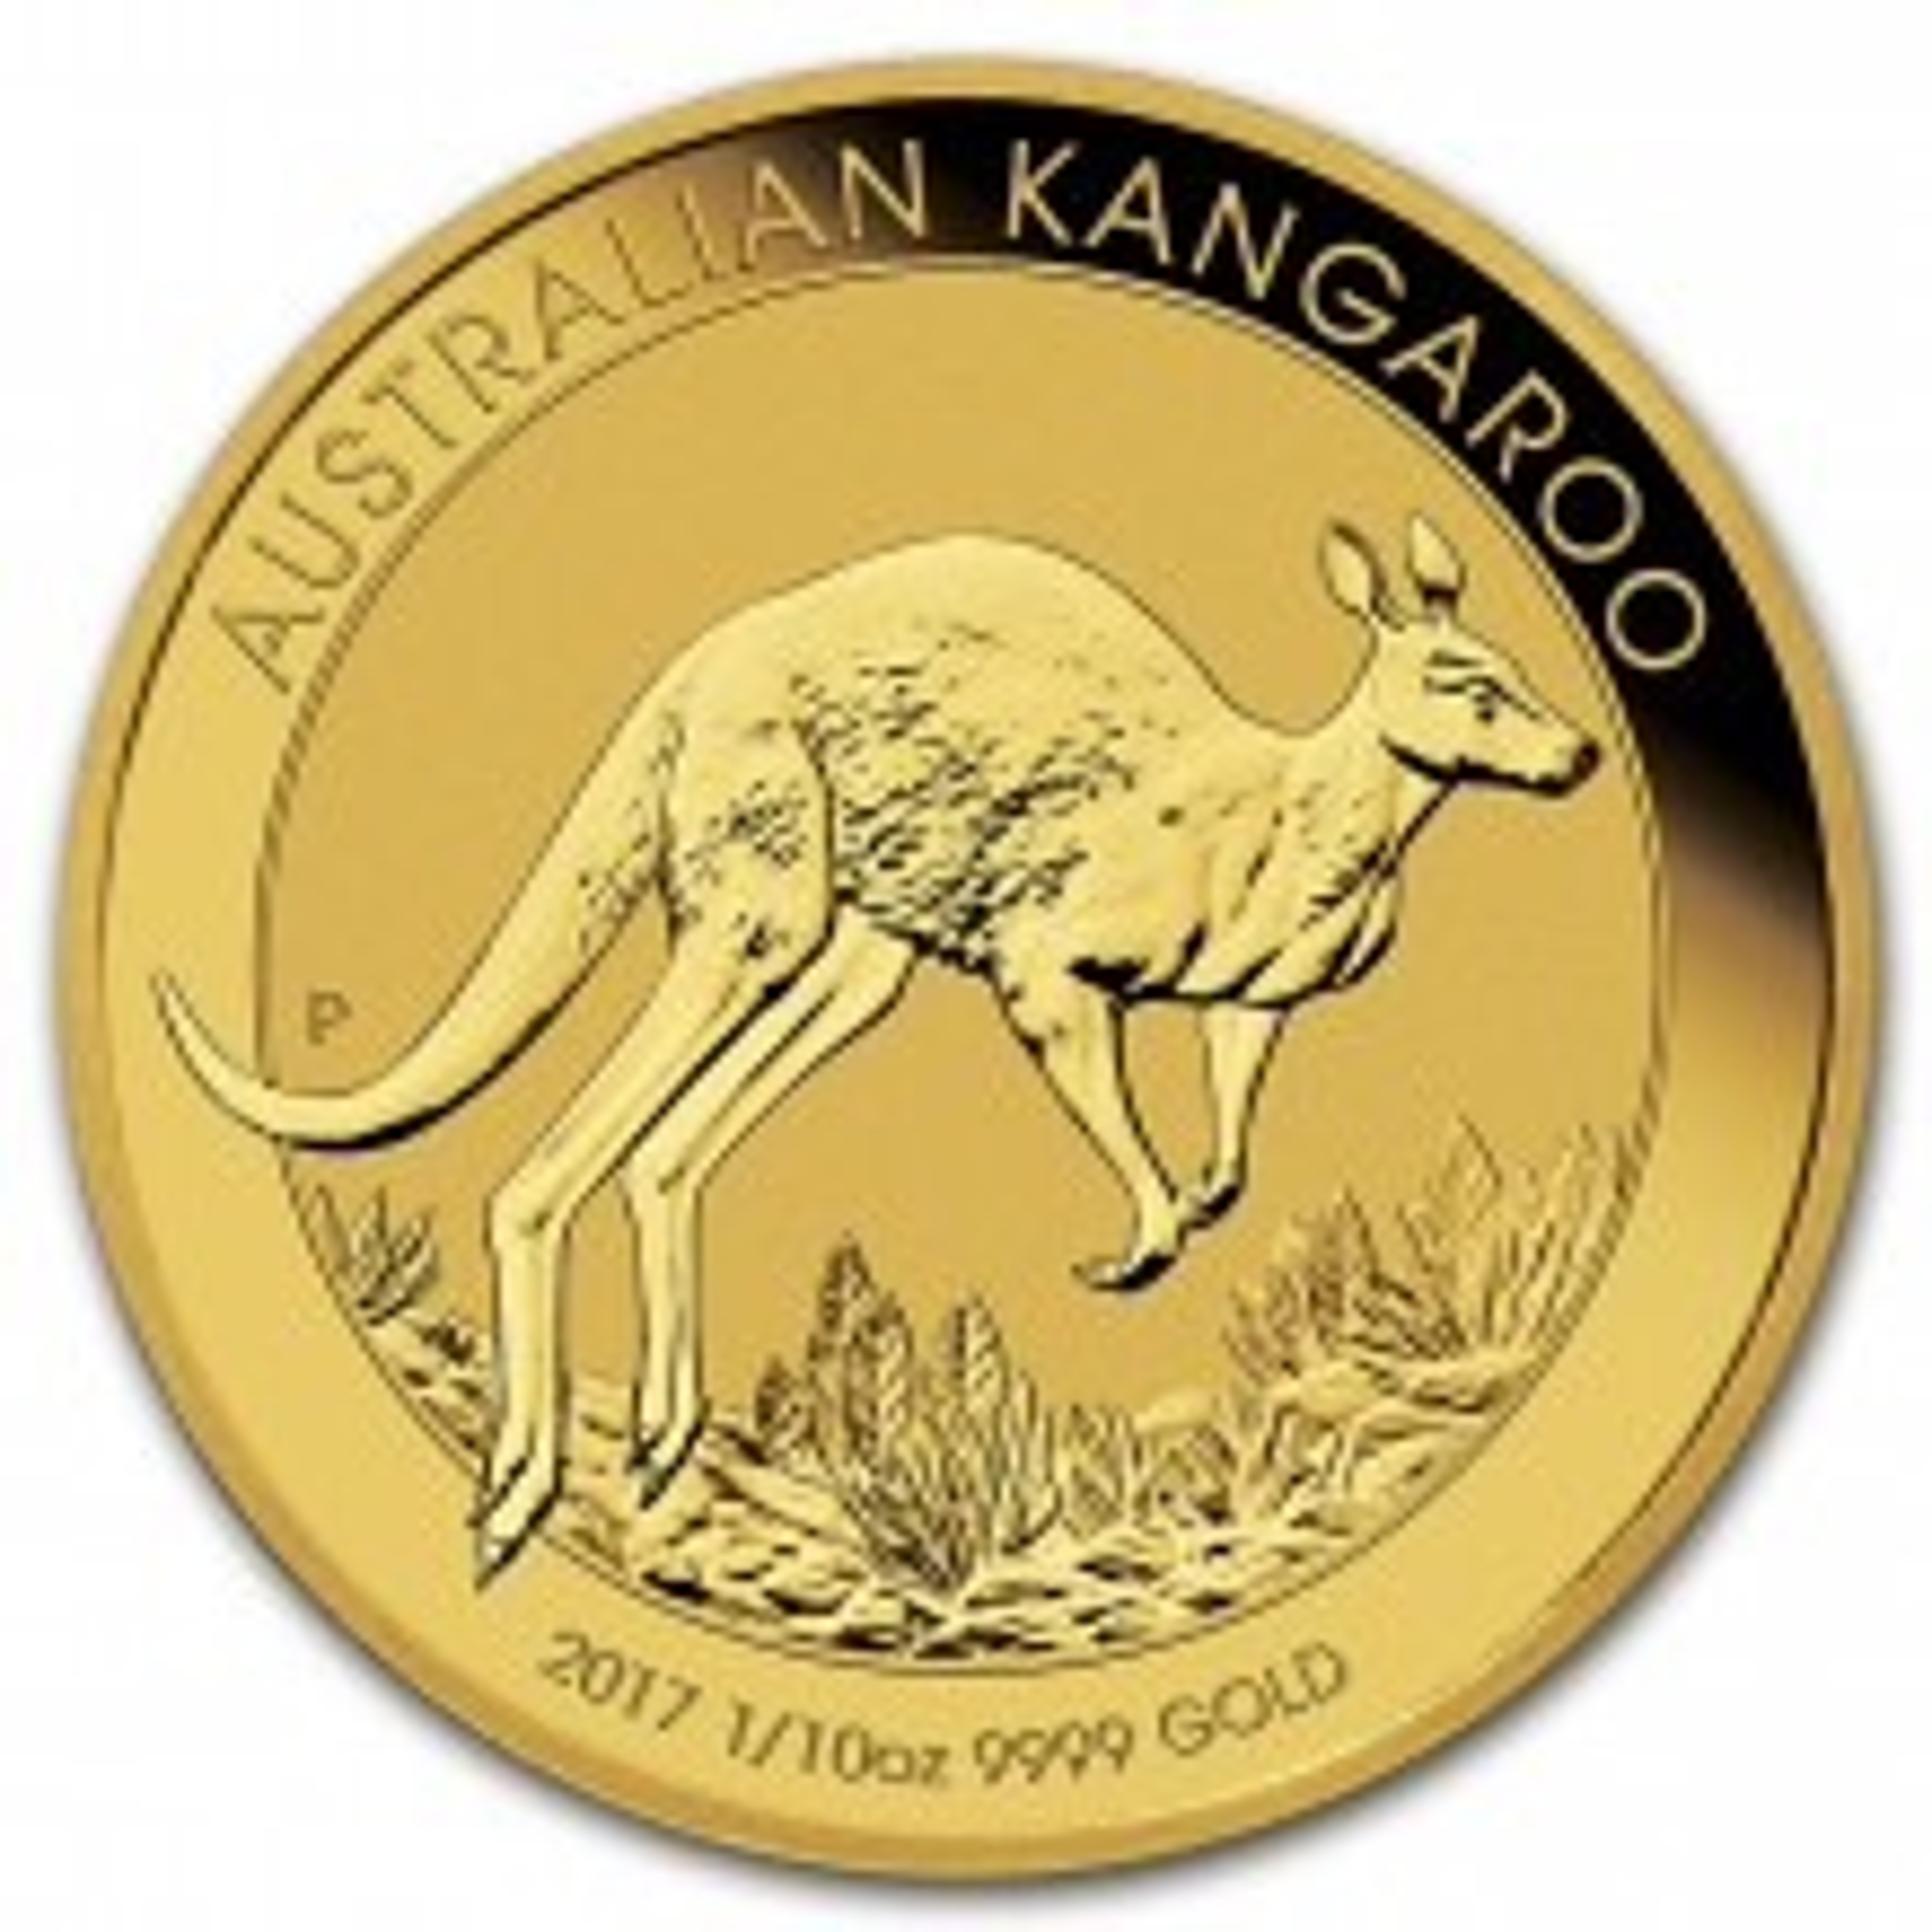 Gouden 1/10 troy ounce Kangaroo munt 2017